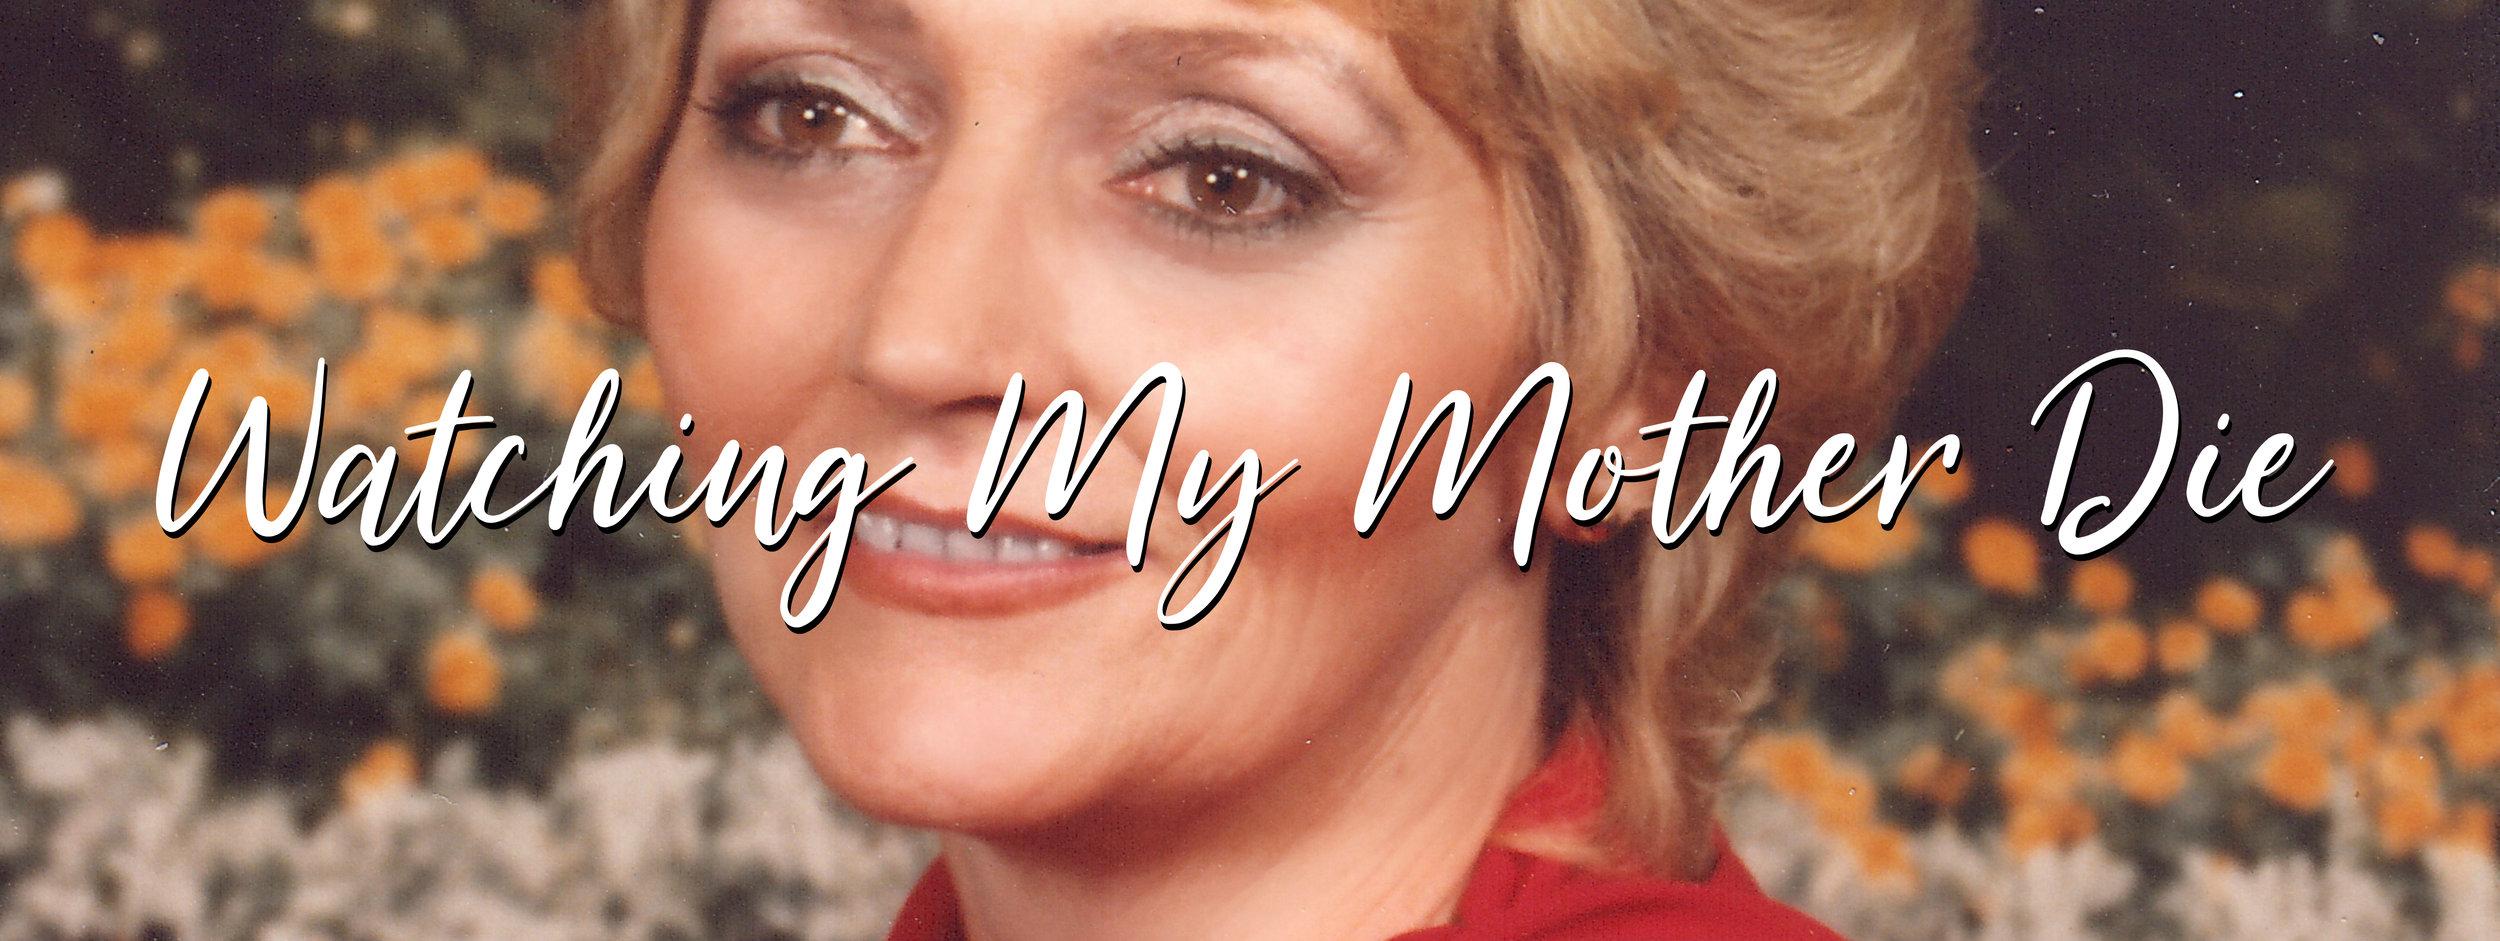 michelle_jester PAGE Watching my Mother Die221qw.jpg